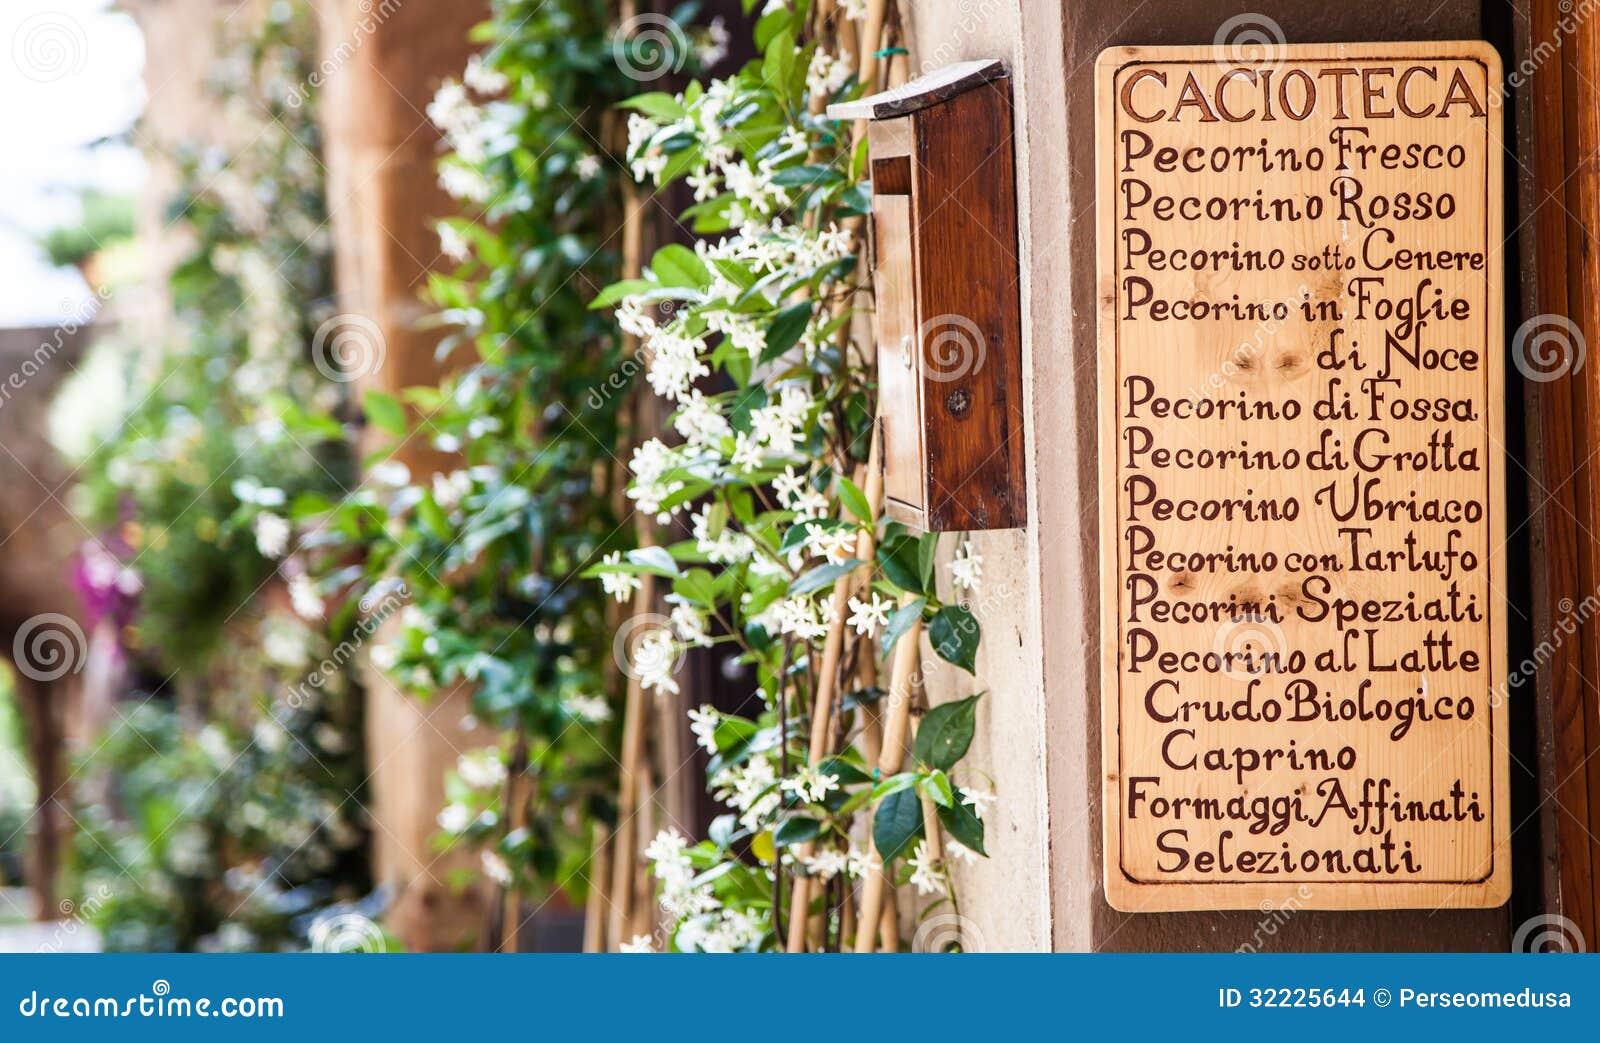 Download Italiano Cacioteca foto de stock. Imagem de italy, tuscan - 32225644